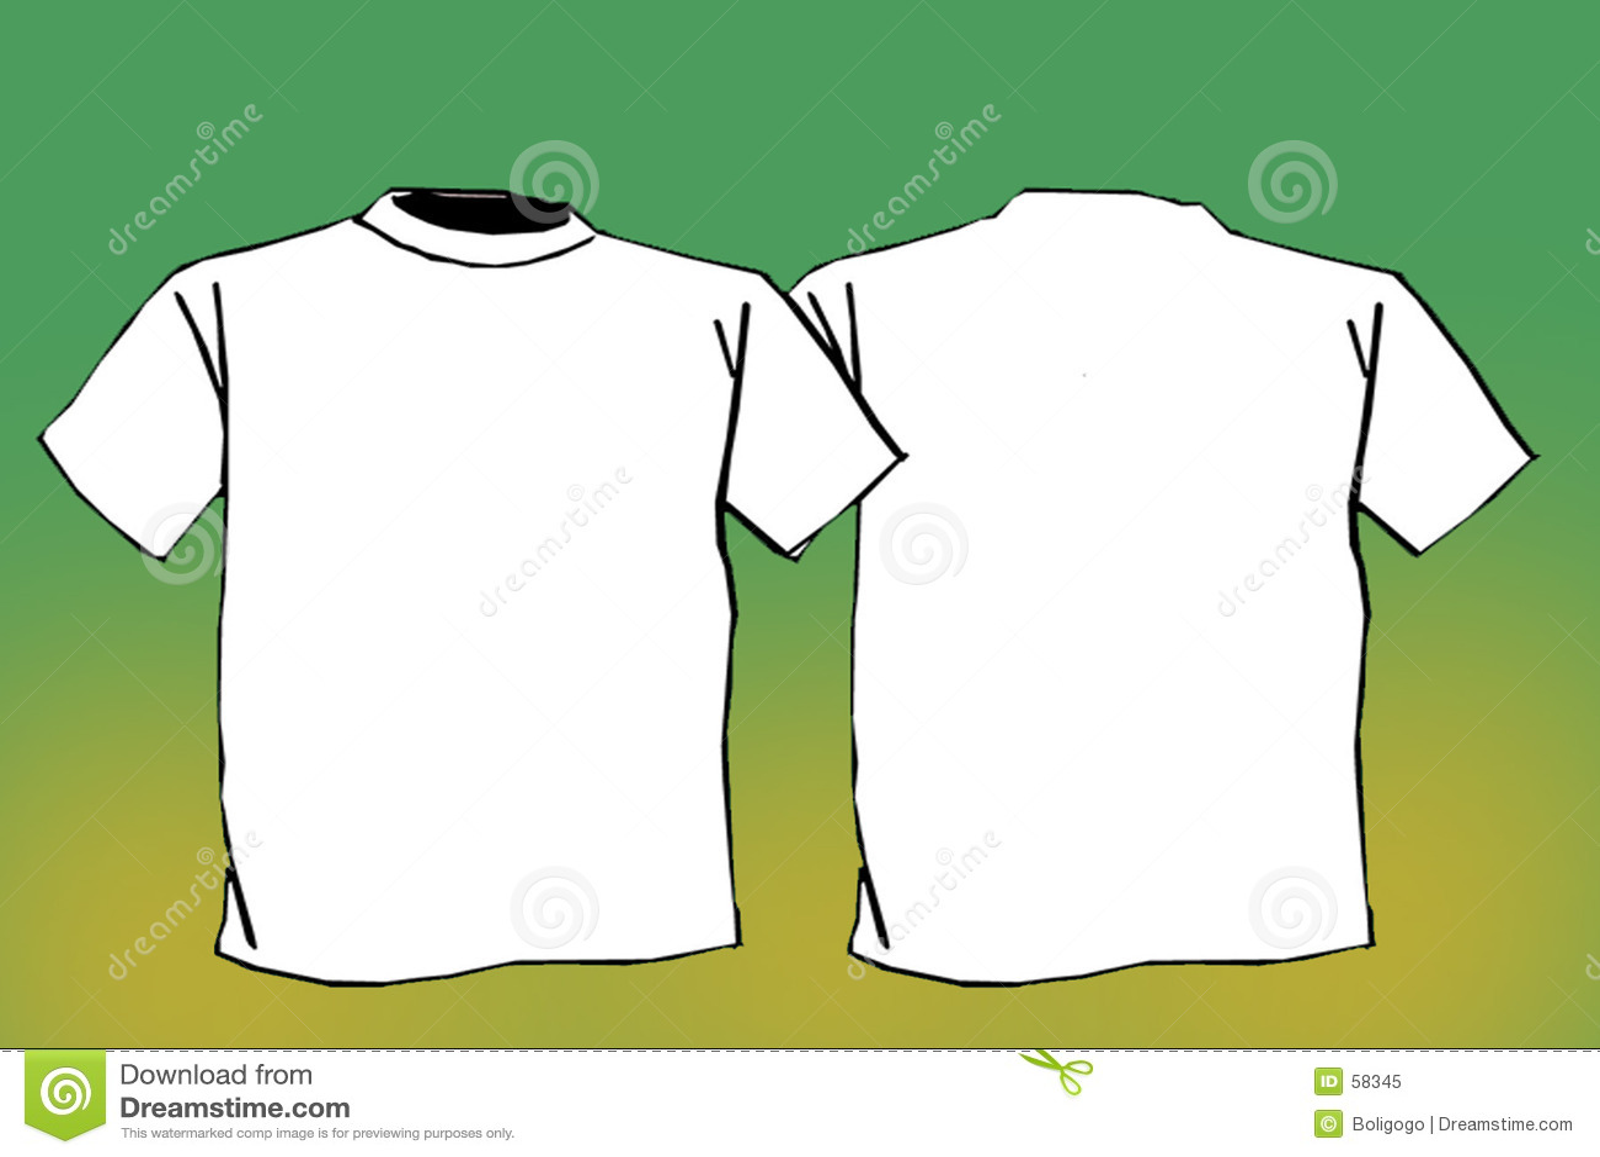 Blank t shirt royalty free stock photo image 58345 for Blank tee shirts com